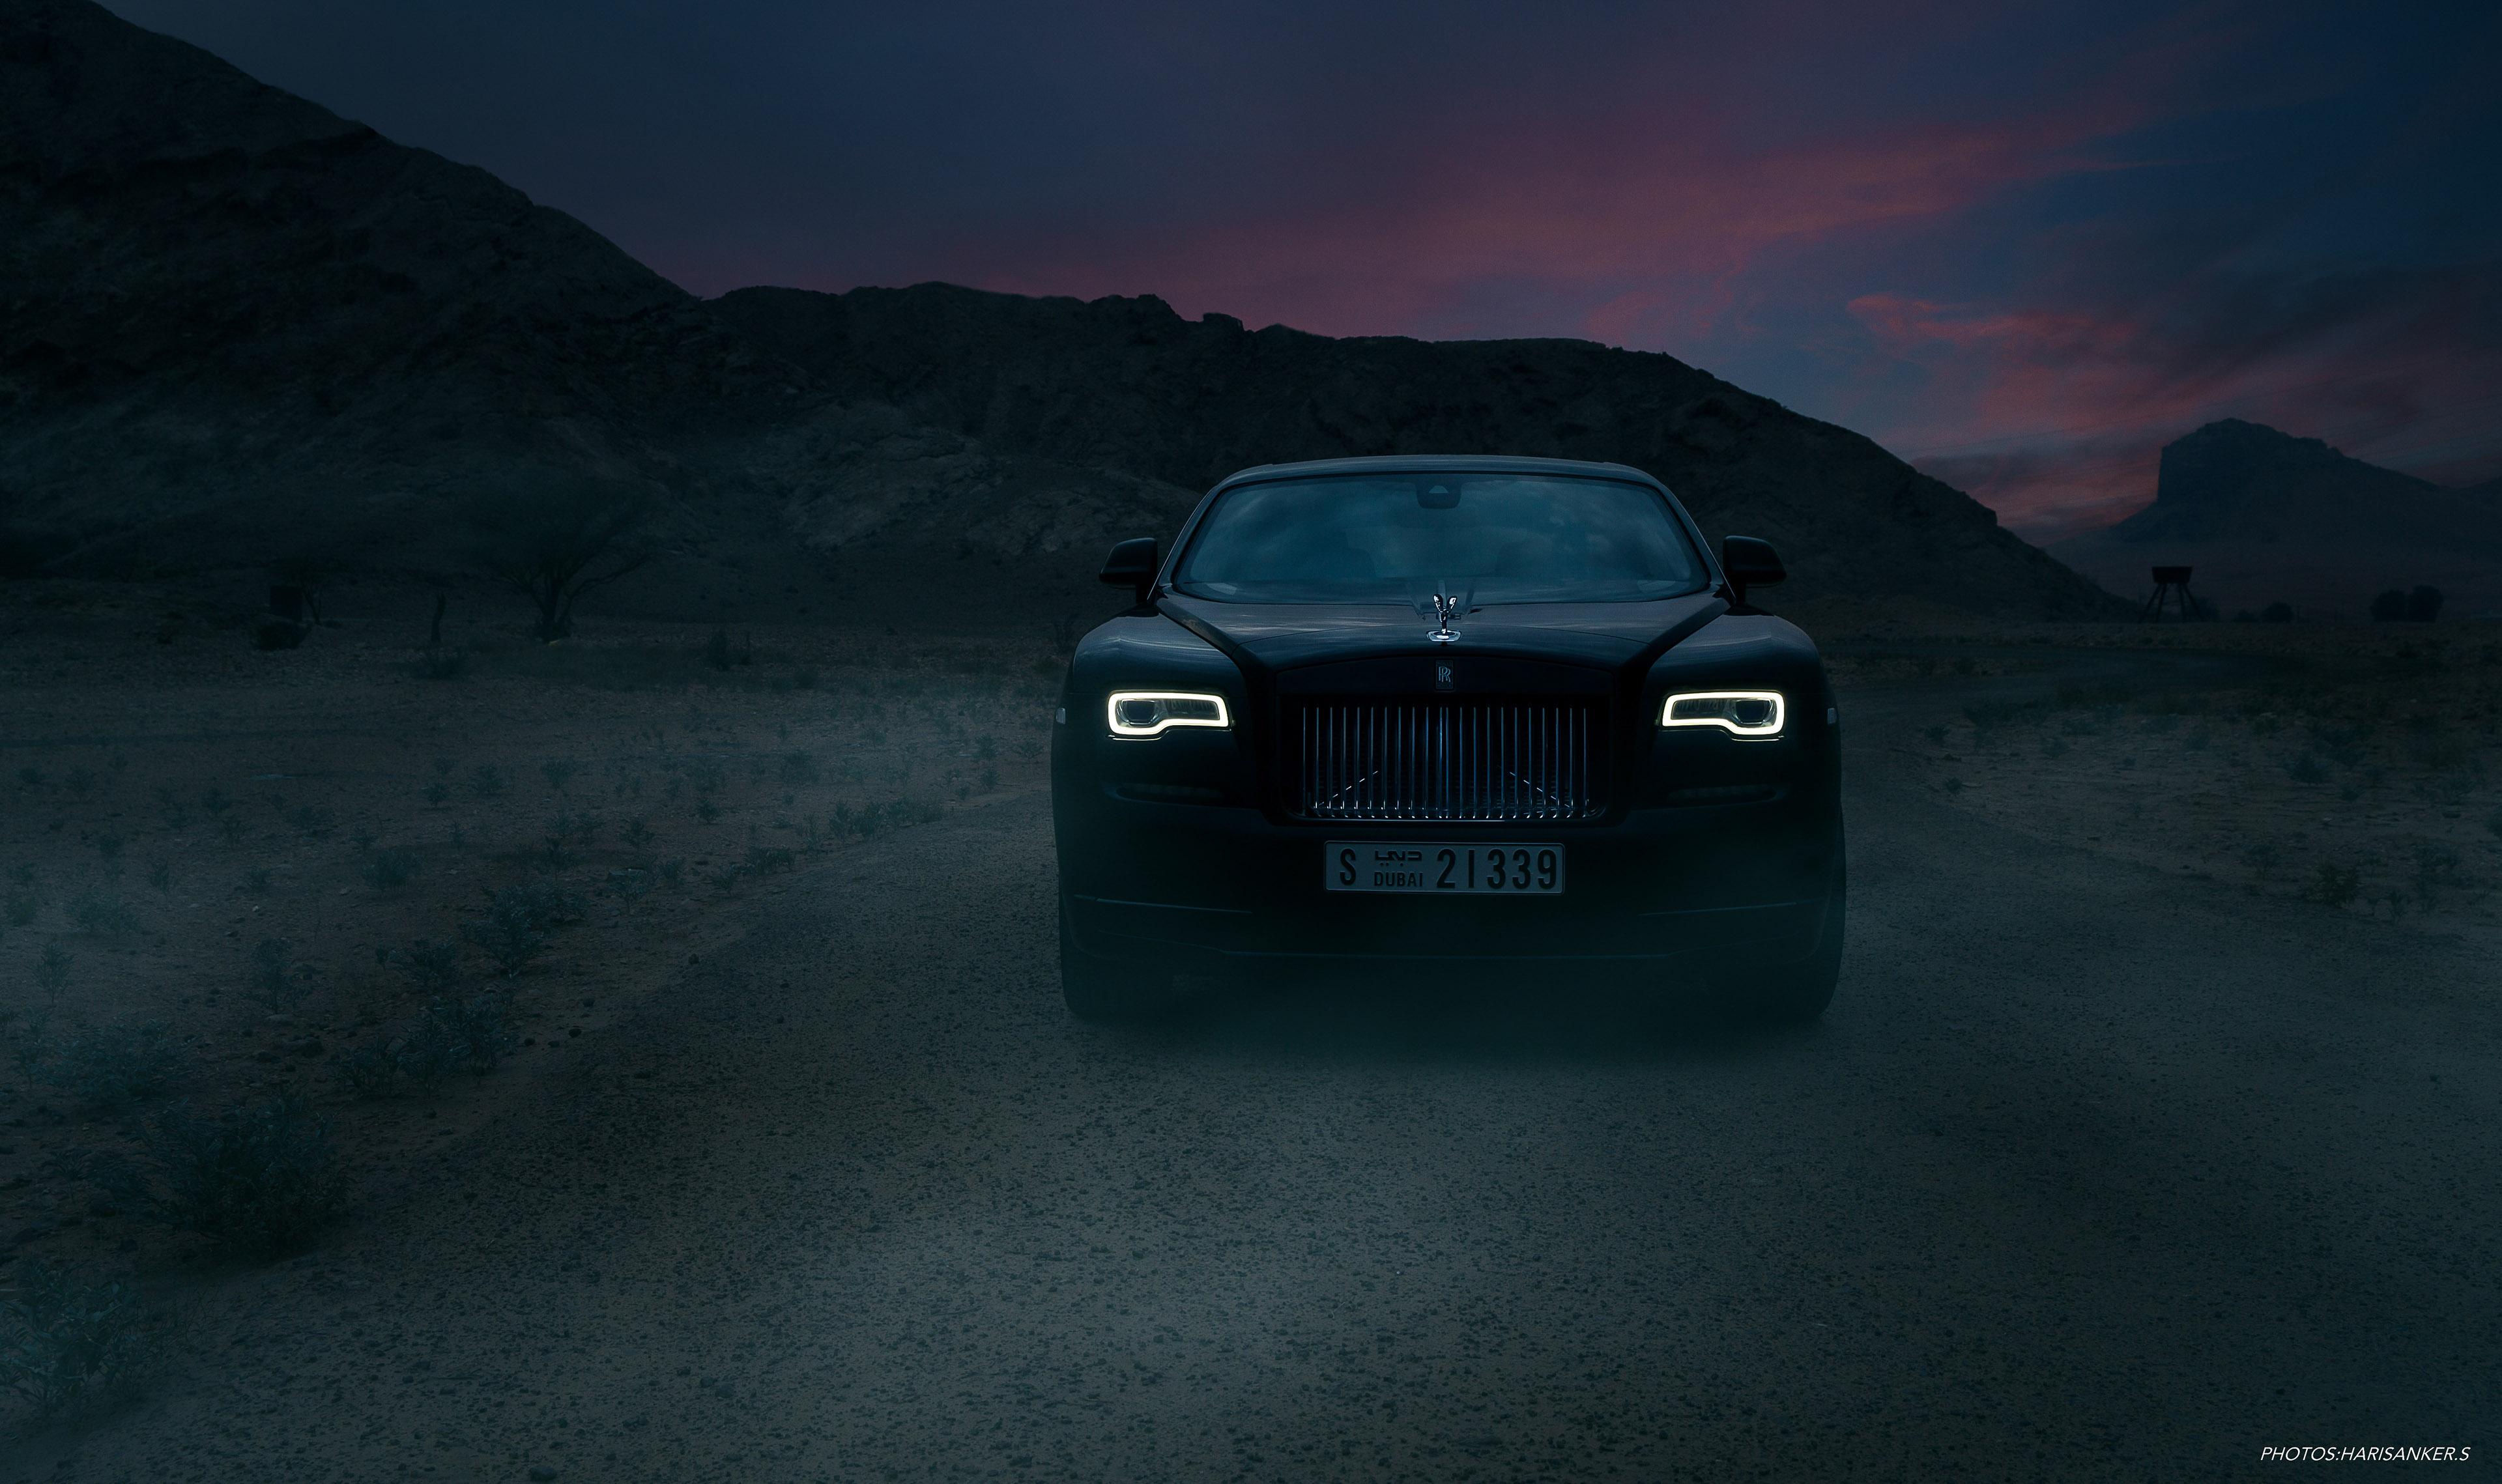 Rolls Royce Wraith Black Badge Hd Cars 4k Wallpapers